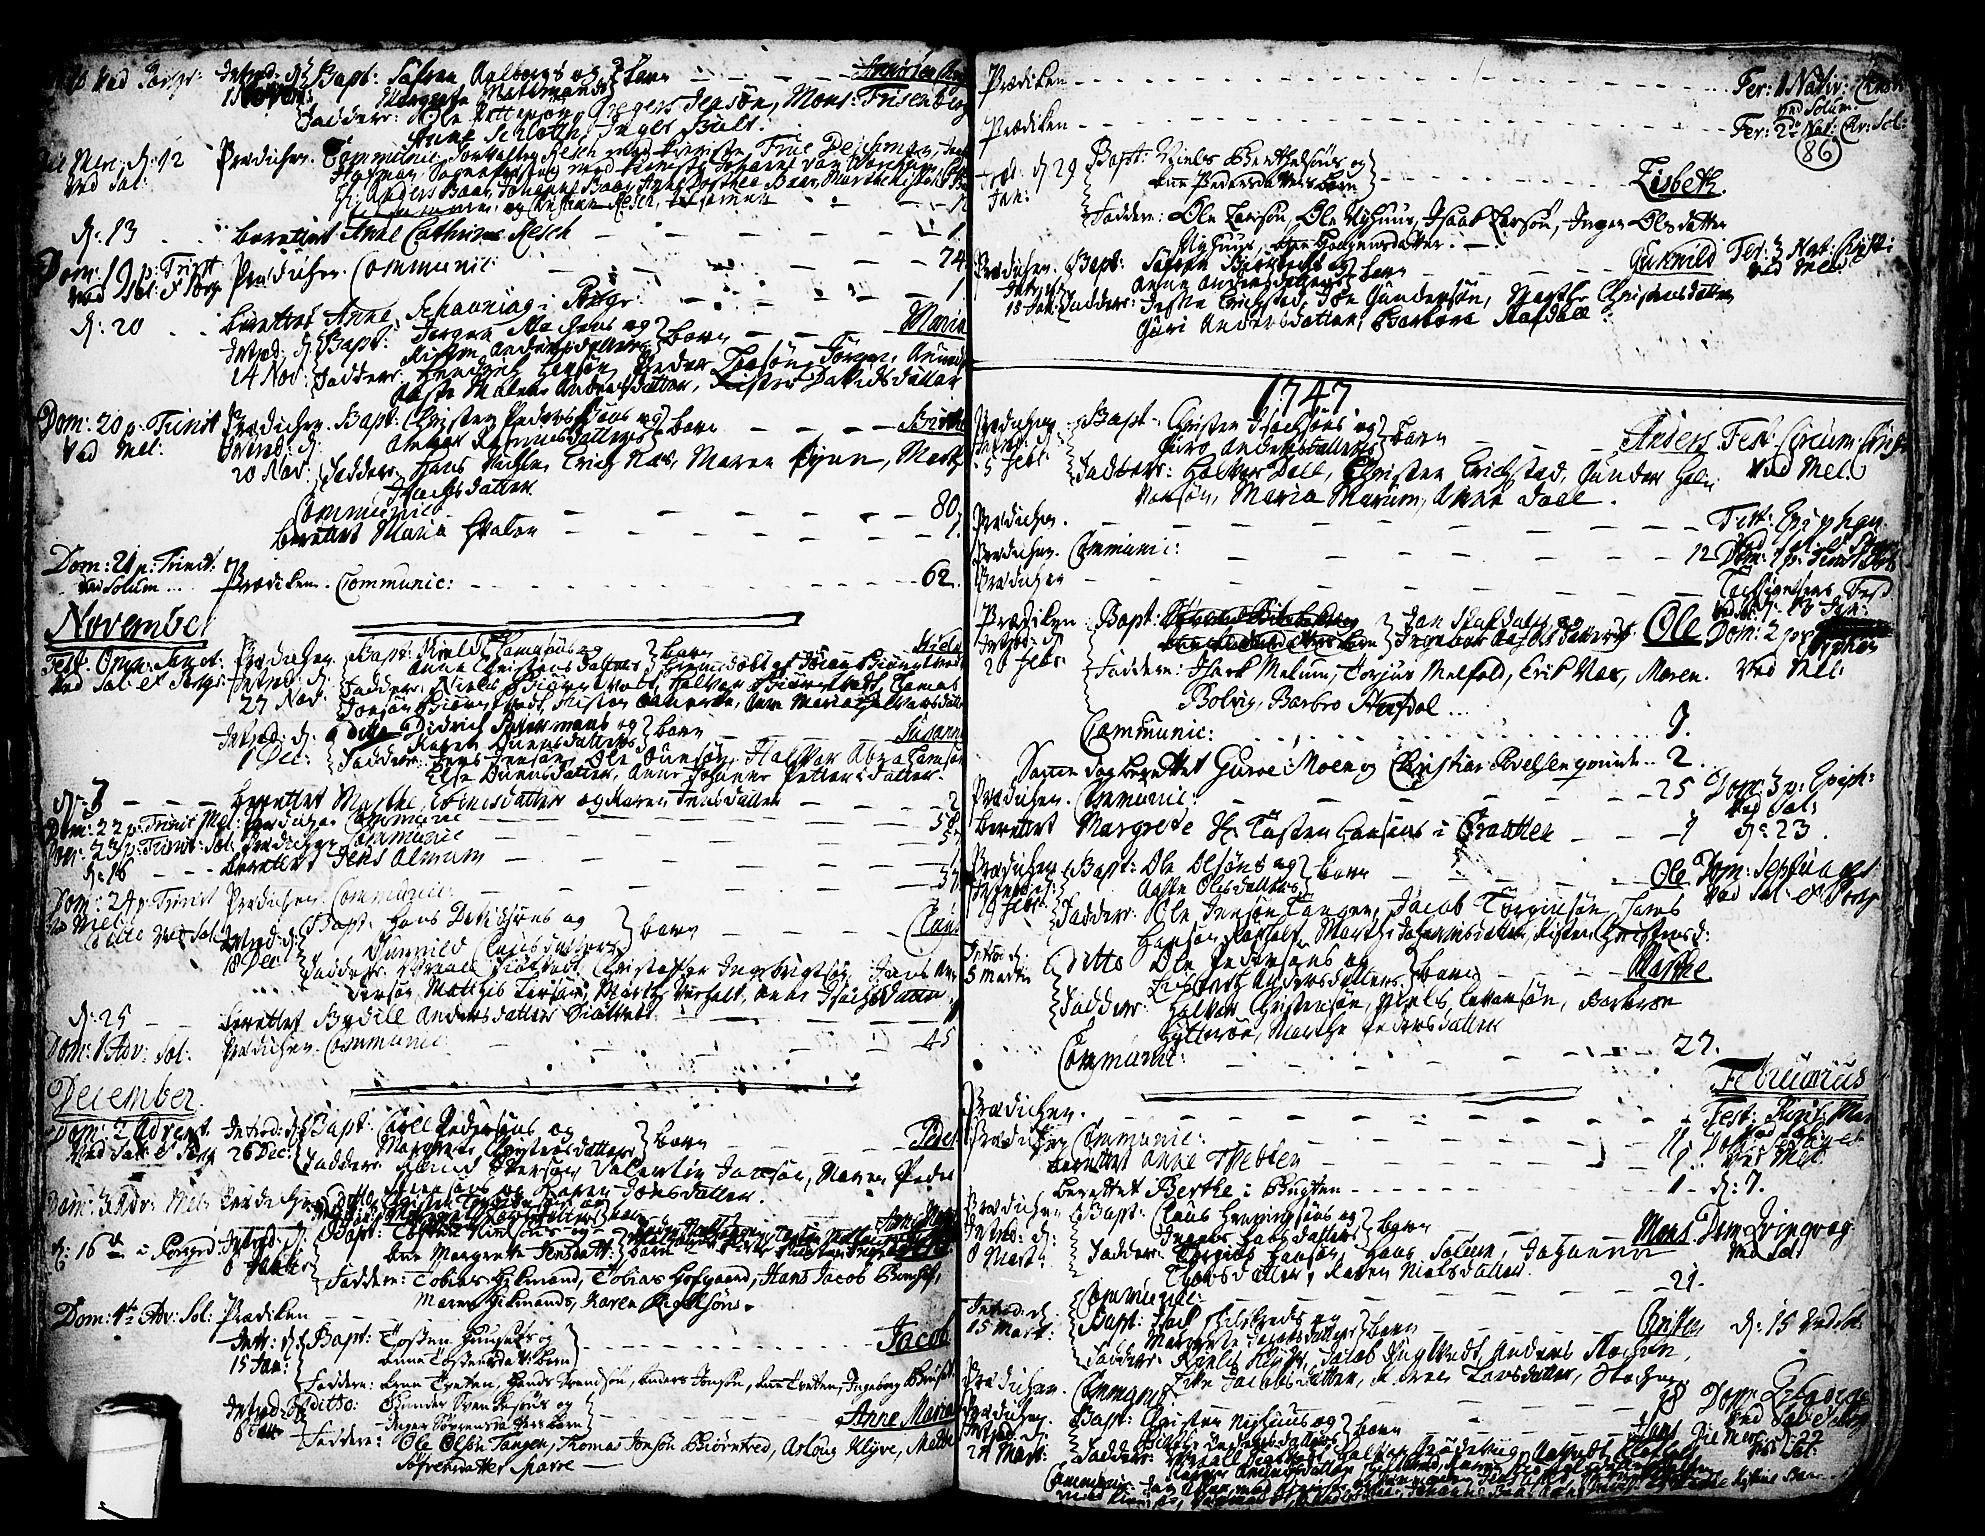 SAKO, Solum kirkebøker, F/Fa/L0002: Ministerialbok nr. I 2, 1713-1761, s. 86